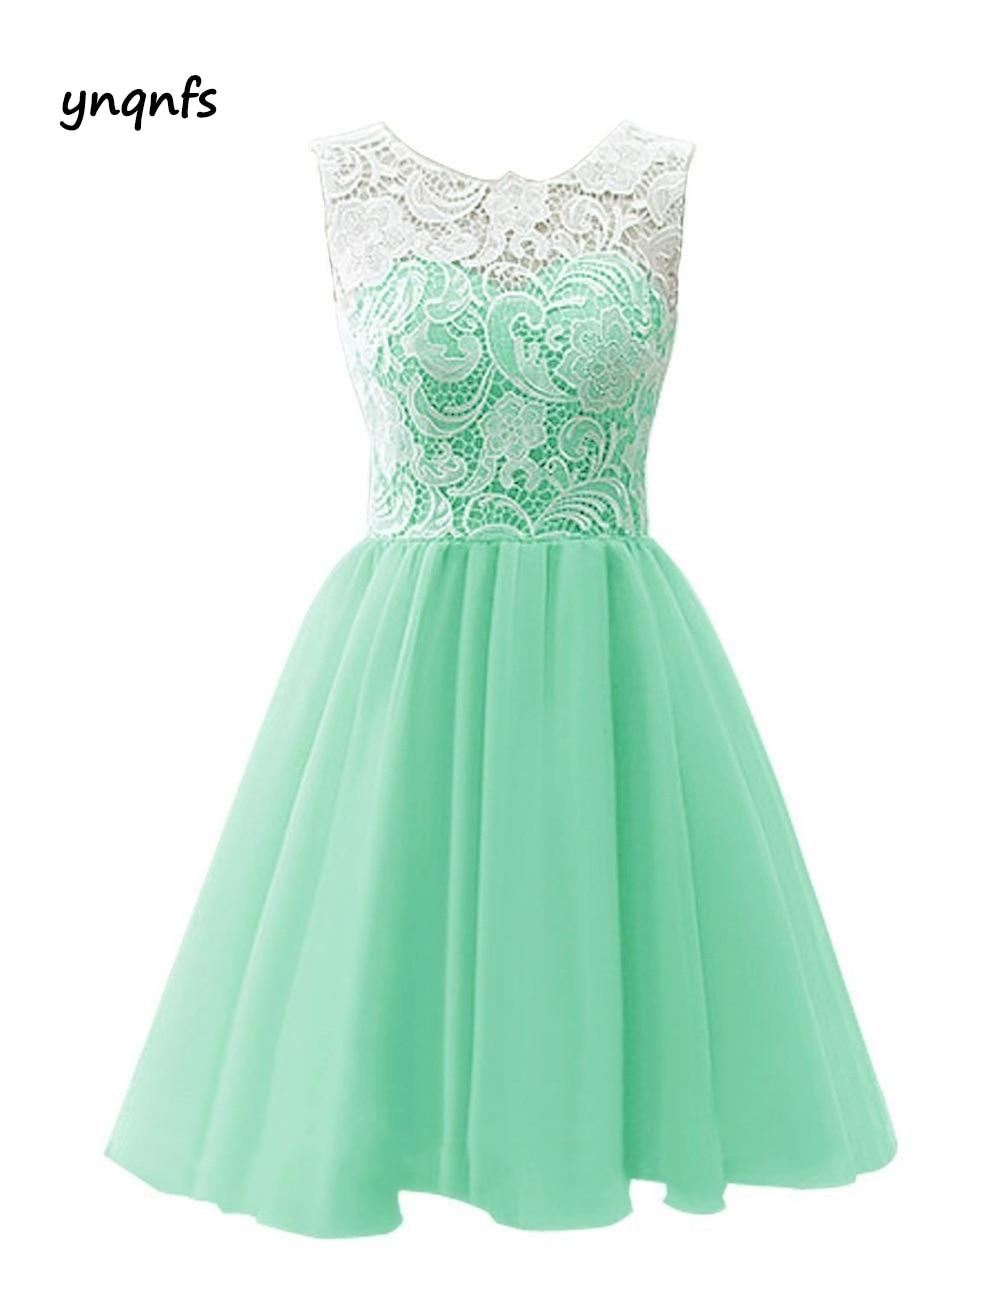 07d648f87dad1 On Sale ynqnfs Boutique Wedding Party Dress Multi Color Bridesmaid ...